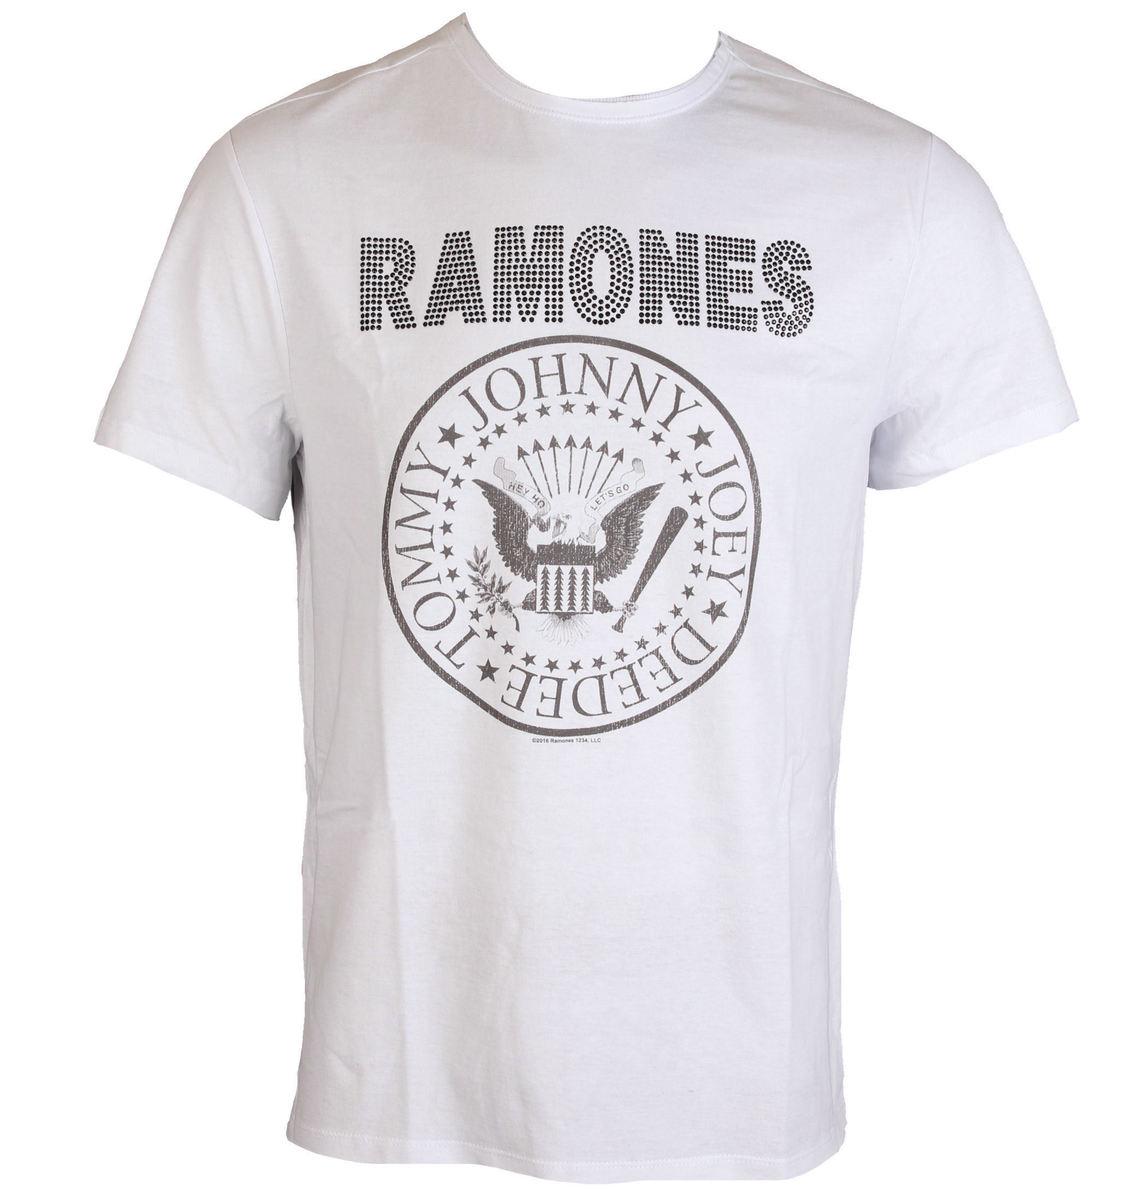 bdf56a397e837 Amplified T Shirts Ramones - DREAMWORKS